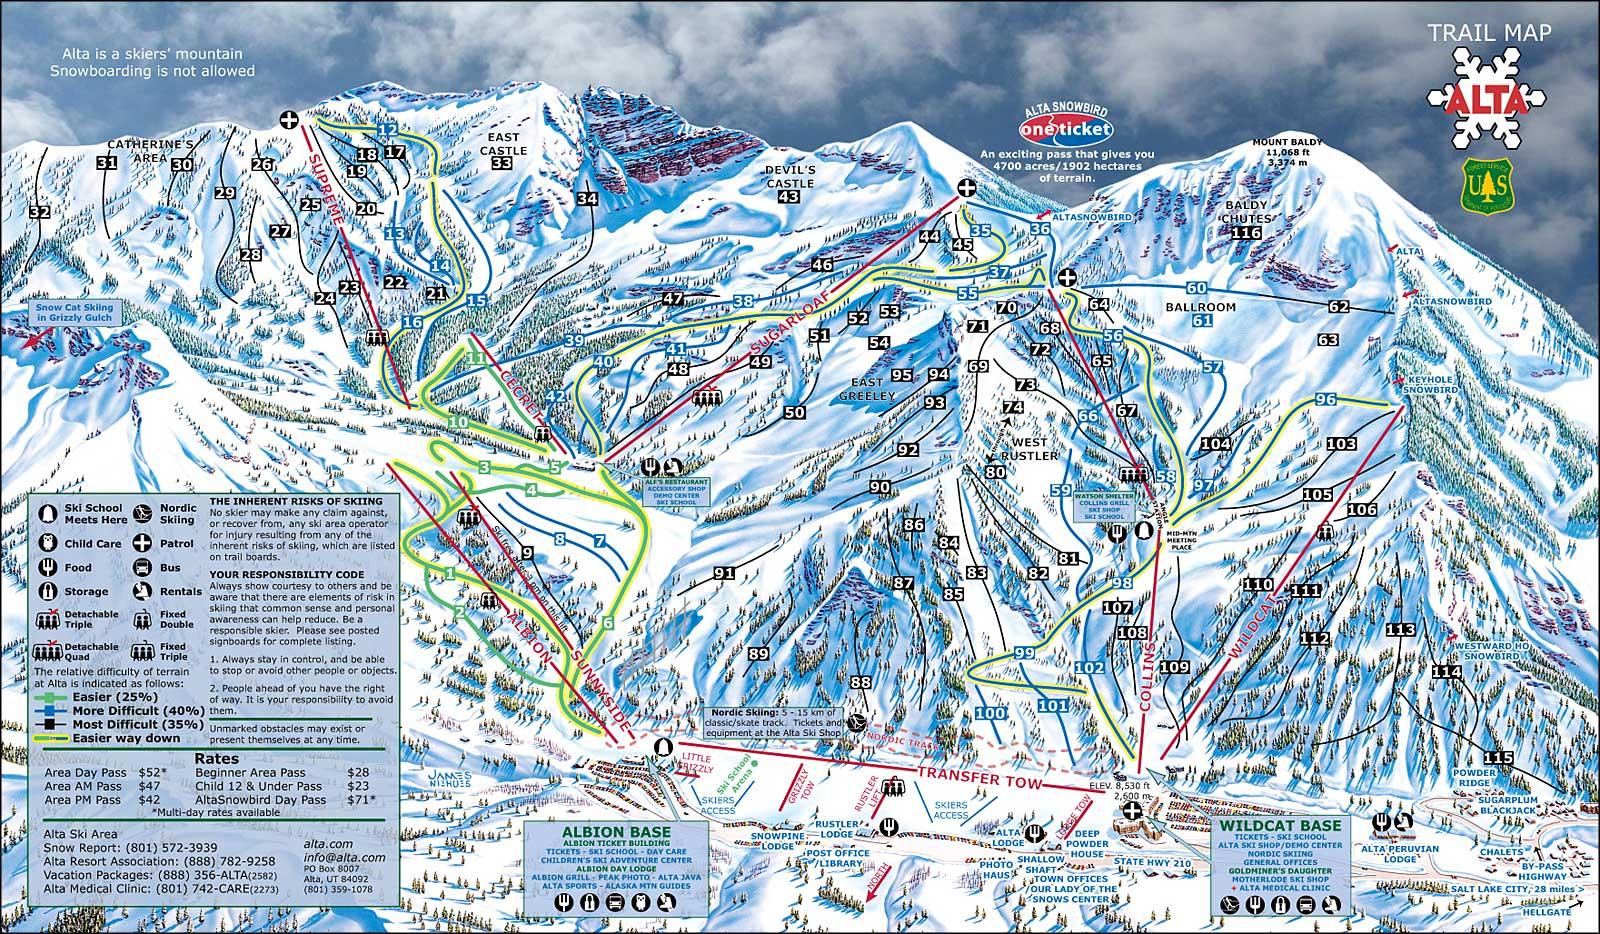 Alta Ski Area Utah Ski And Snowboard Areas